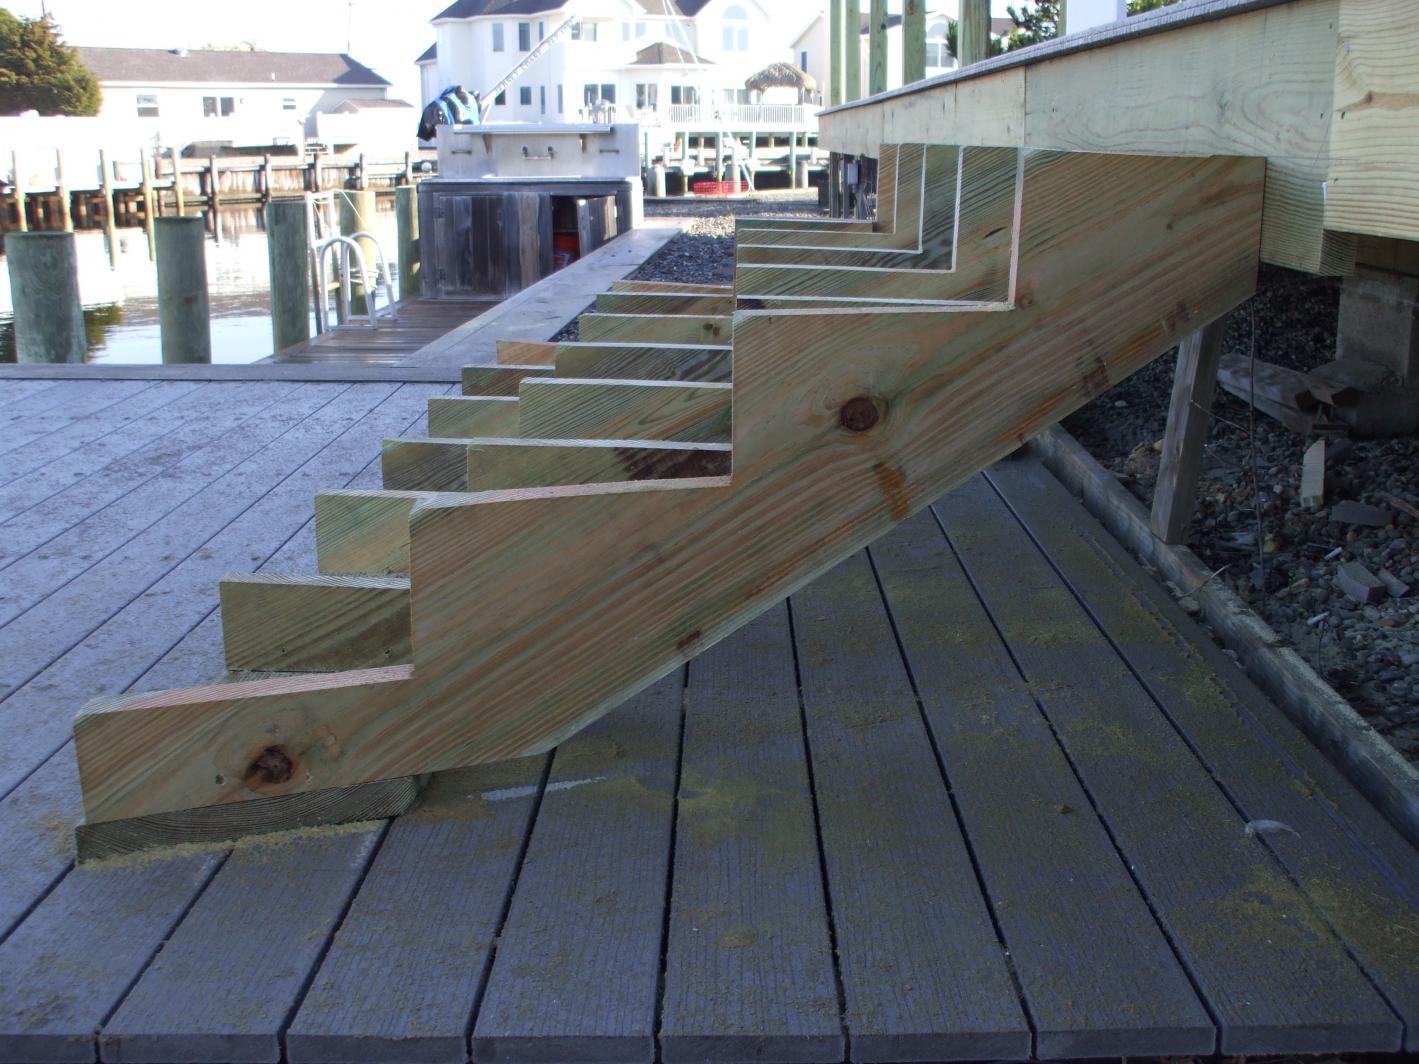 Merveilleux Framing Help For Inside Corner Stairs Decks Fencing